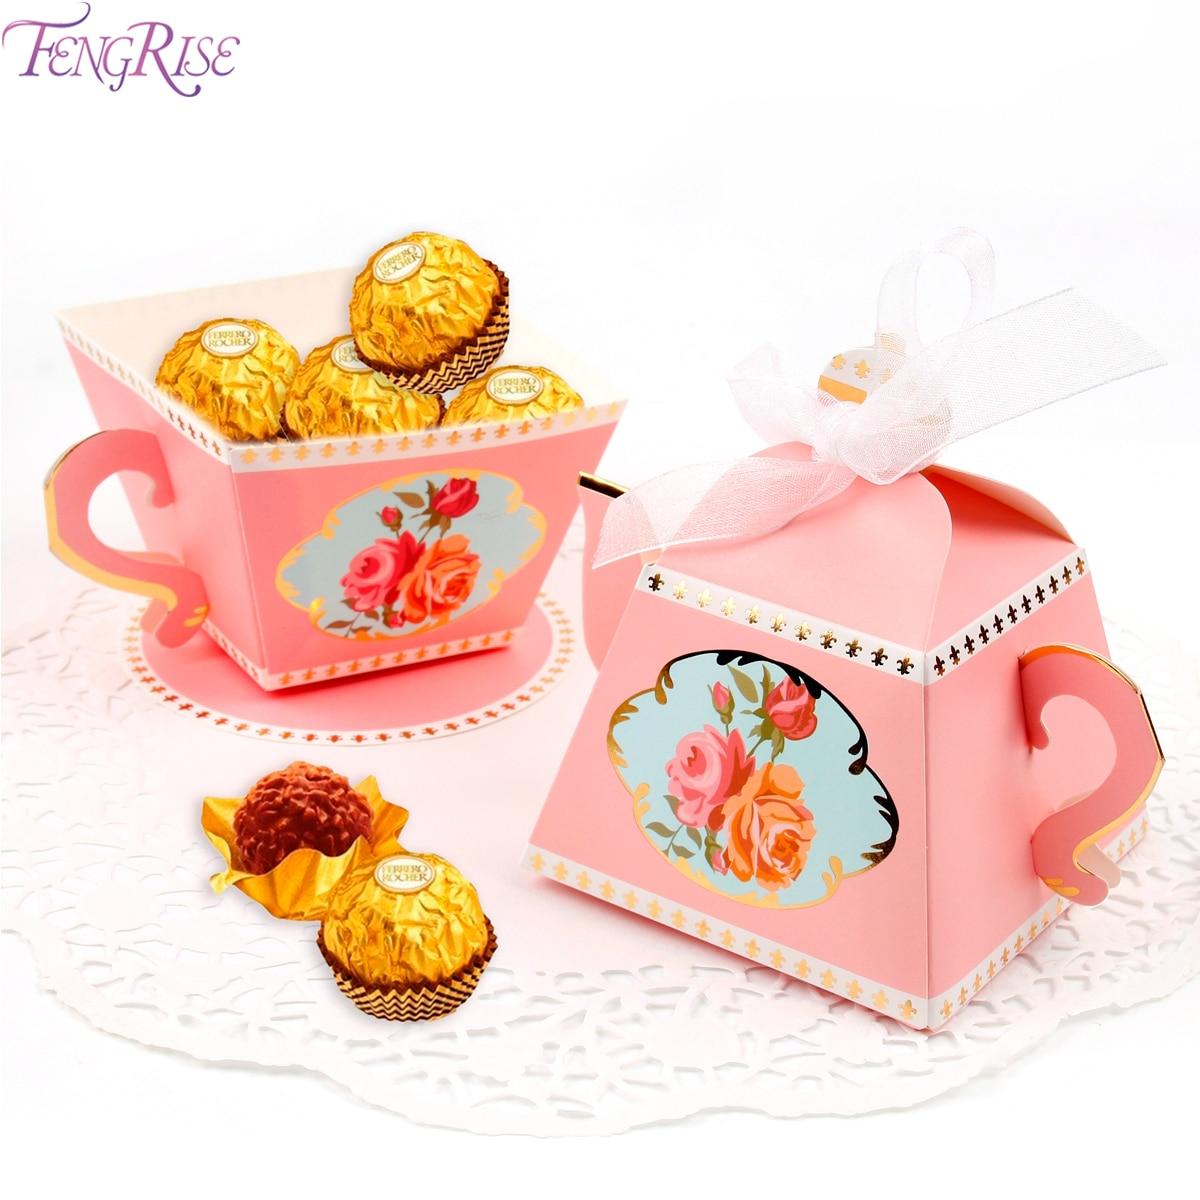 Big Heard Love 25pcs/lots Teacup Teapot Wedding Gift Candy Box Baby ...